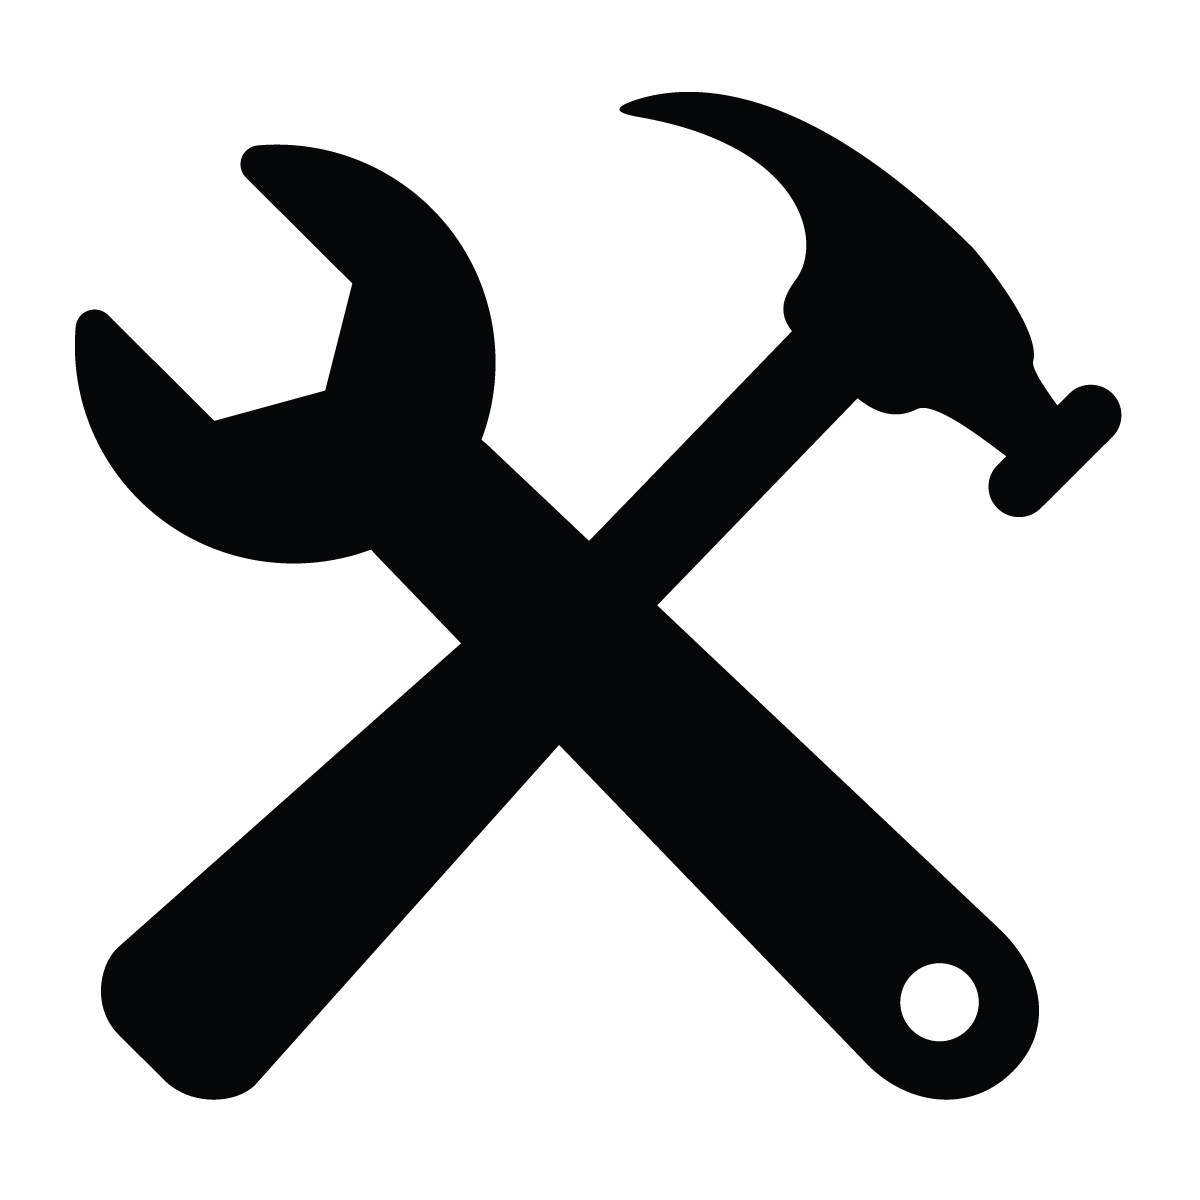 Tool PNG - 1237